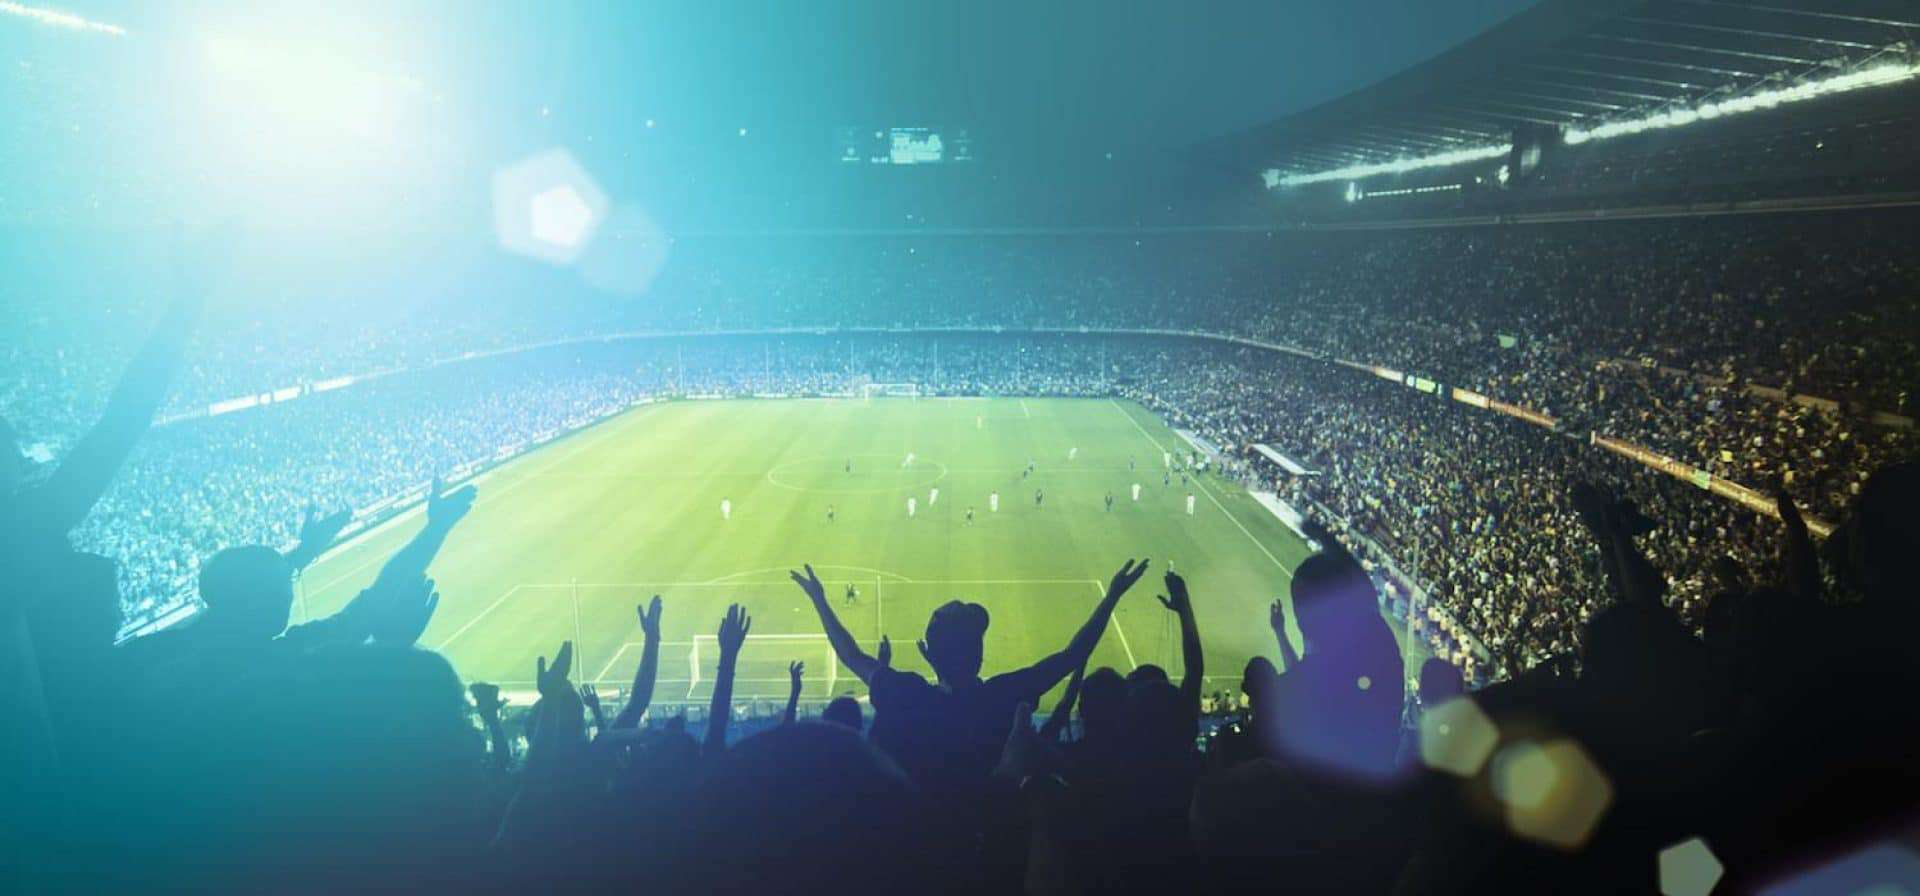 voetbalstadium